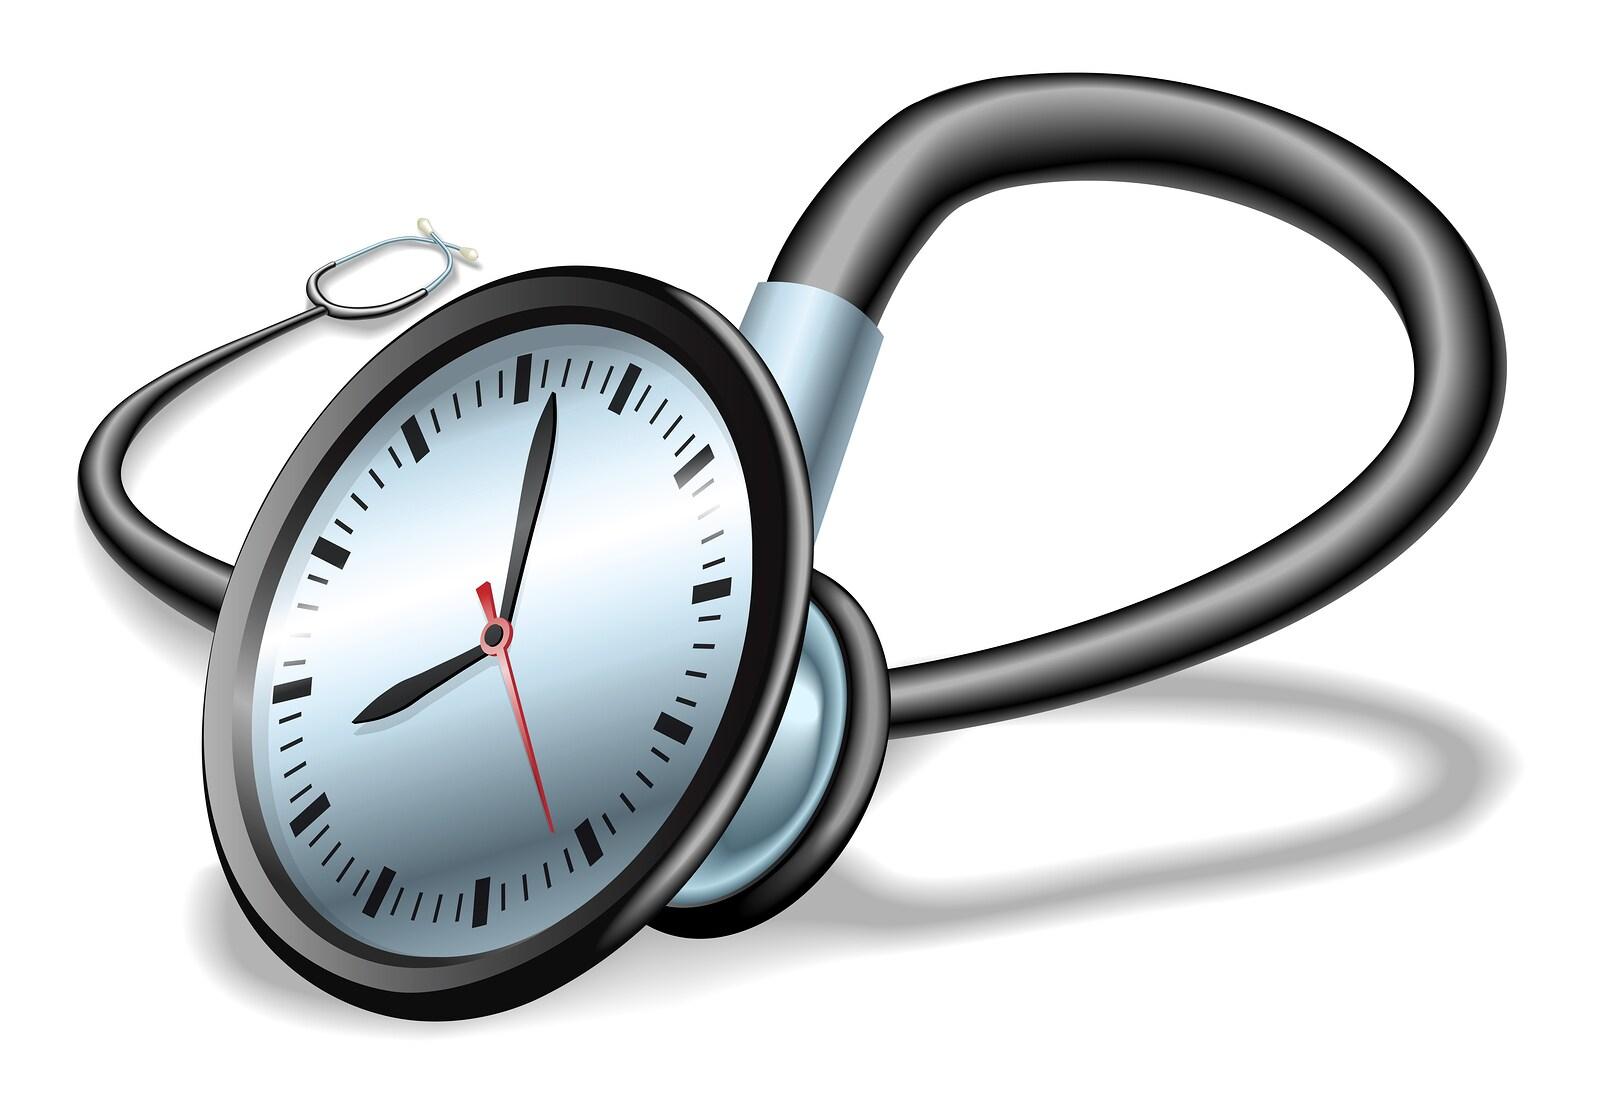 Companies Race To Adjust Health Care Benefits As